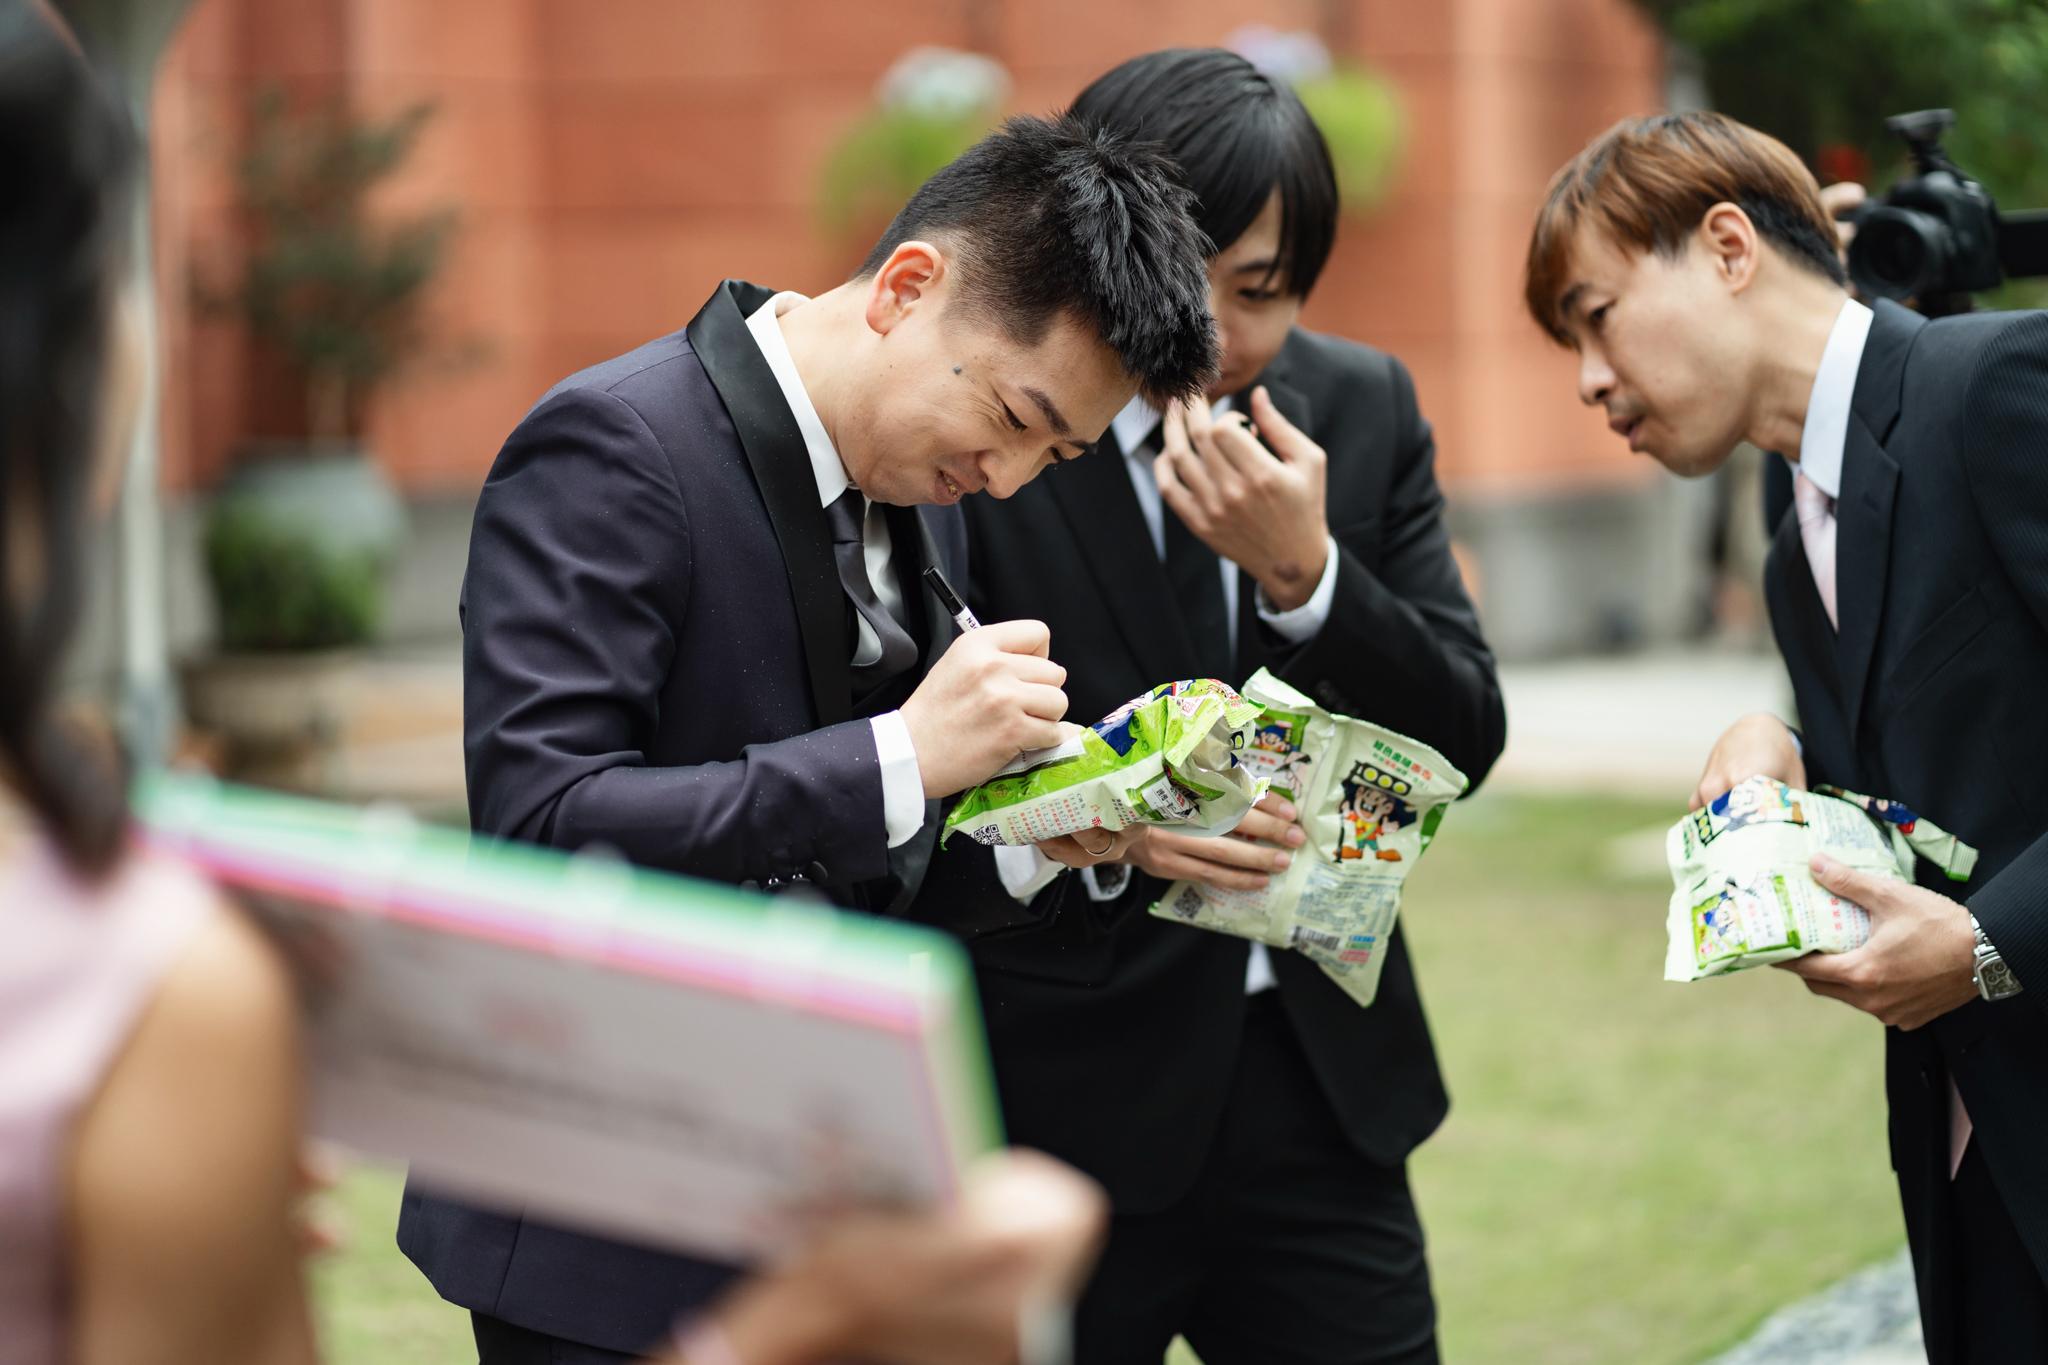 EASTERN WEDDING, 東法, Donfer, 婚禮紀錄, EW, 藝術婚禮, 台北婚攝, 維多麗亞酒店